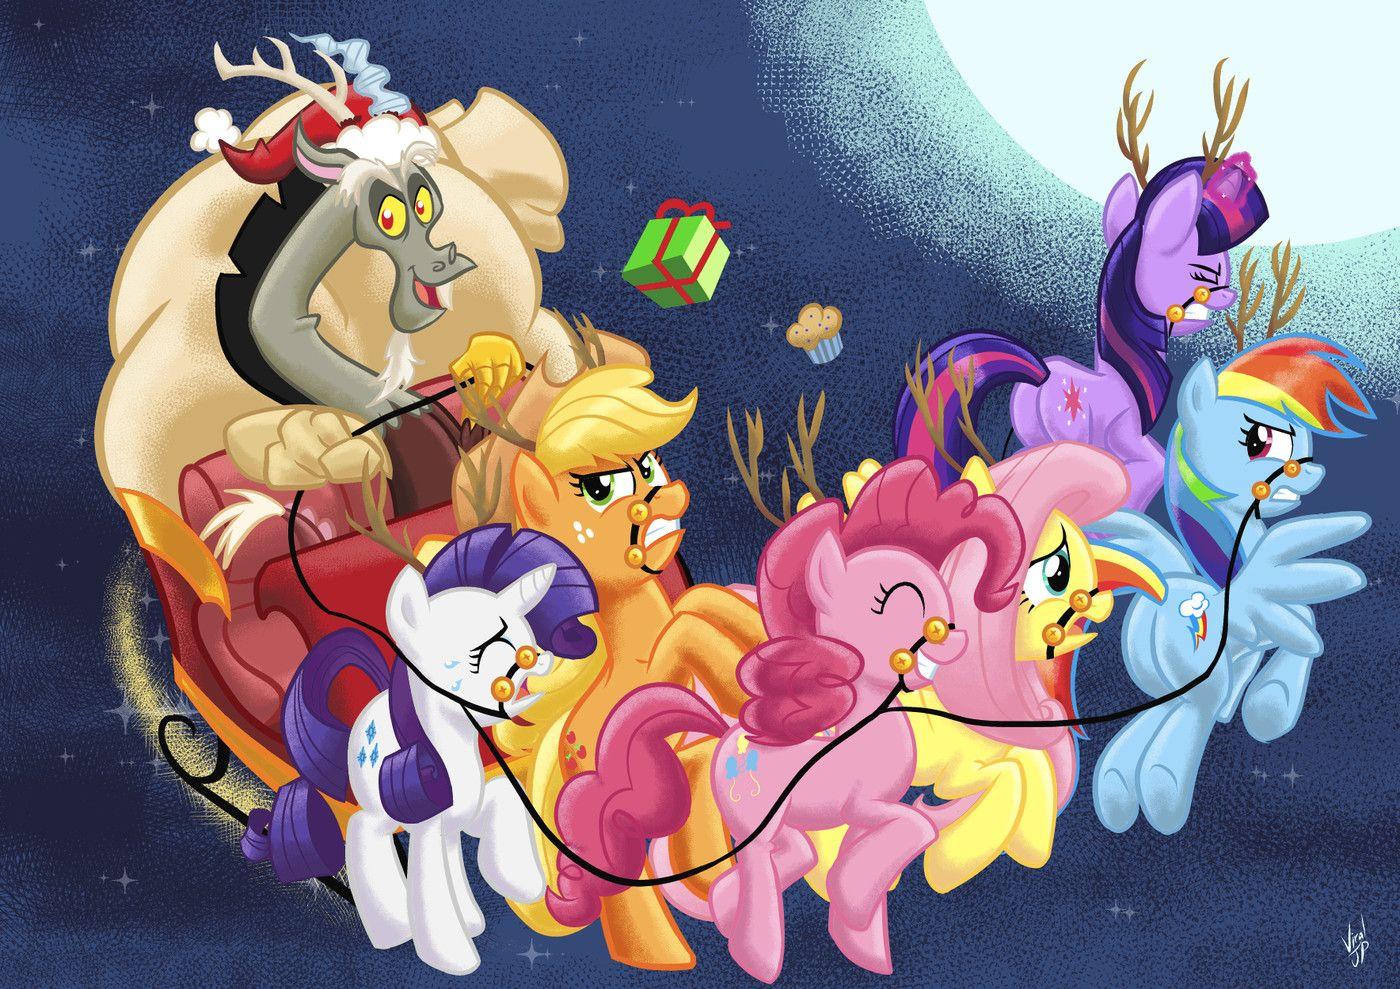 Mlp Christmas.Mlp Christmas Google Search Mlp My Little Pony